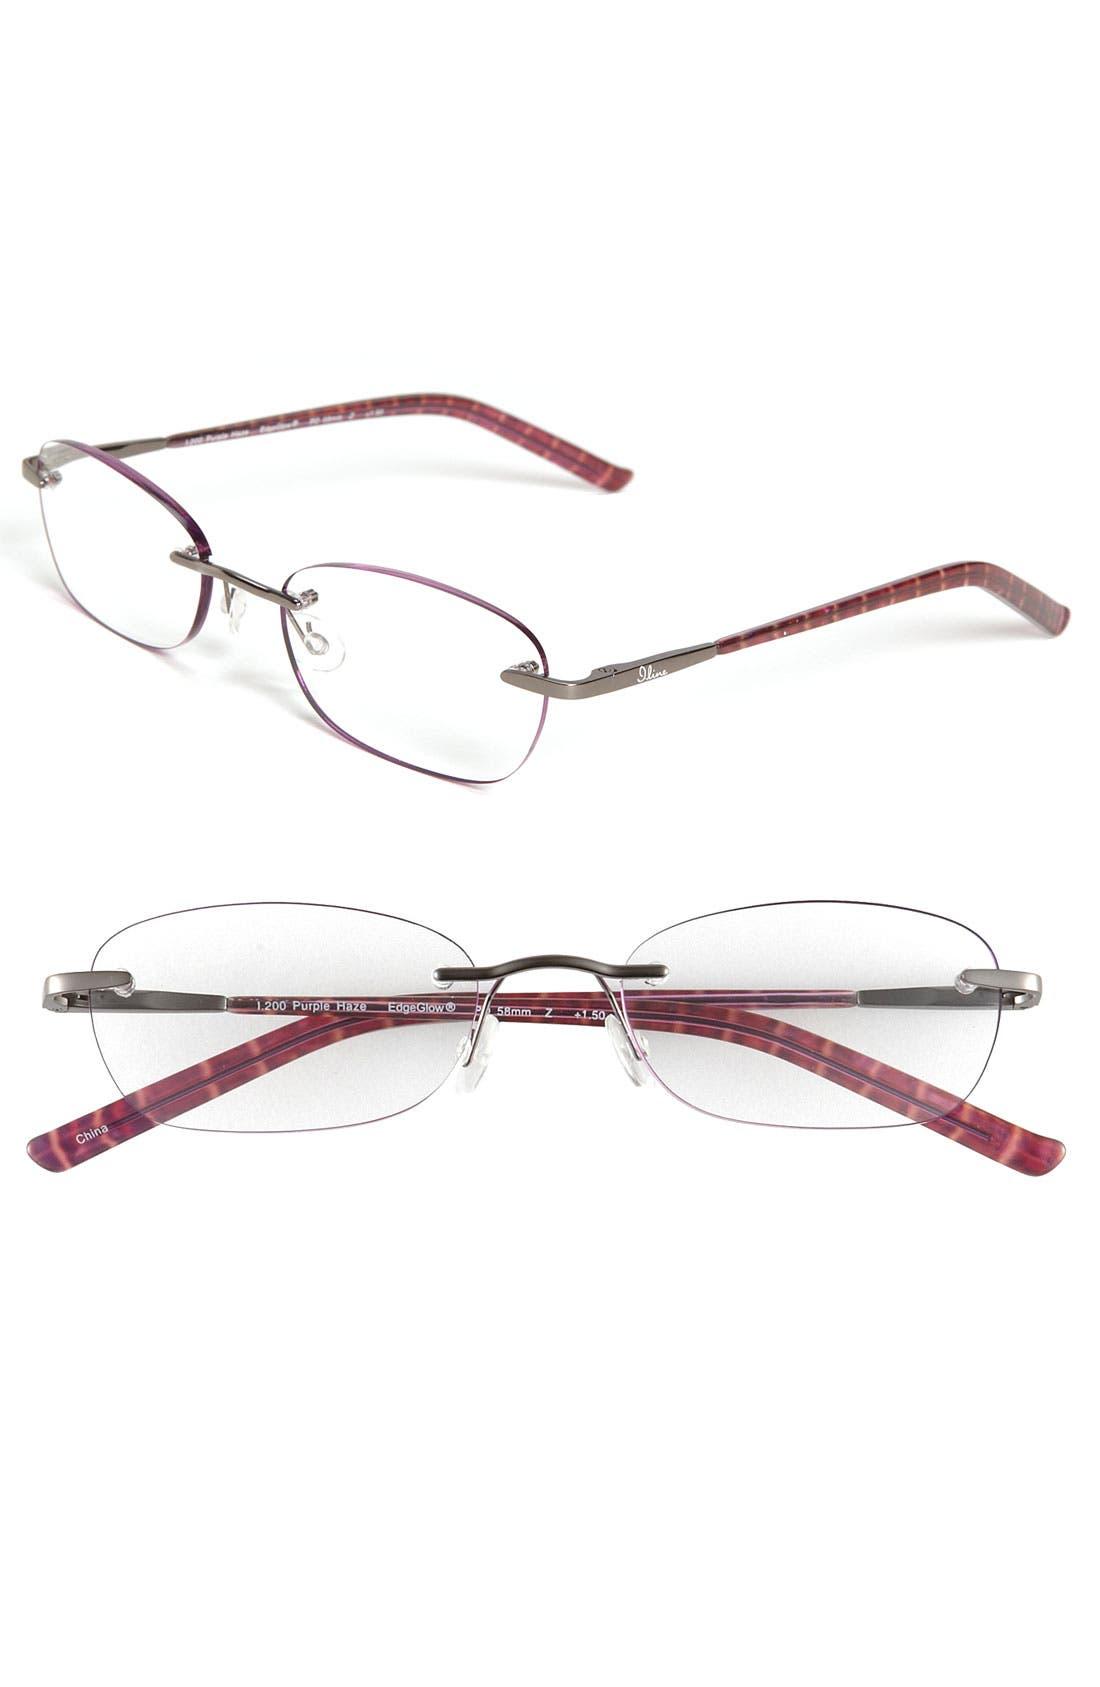 Main Image - I Line Eyewear 'Purple Haze' EdgeGlow® Reading Glasses